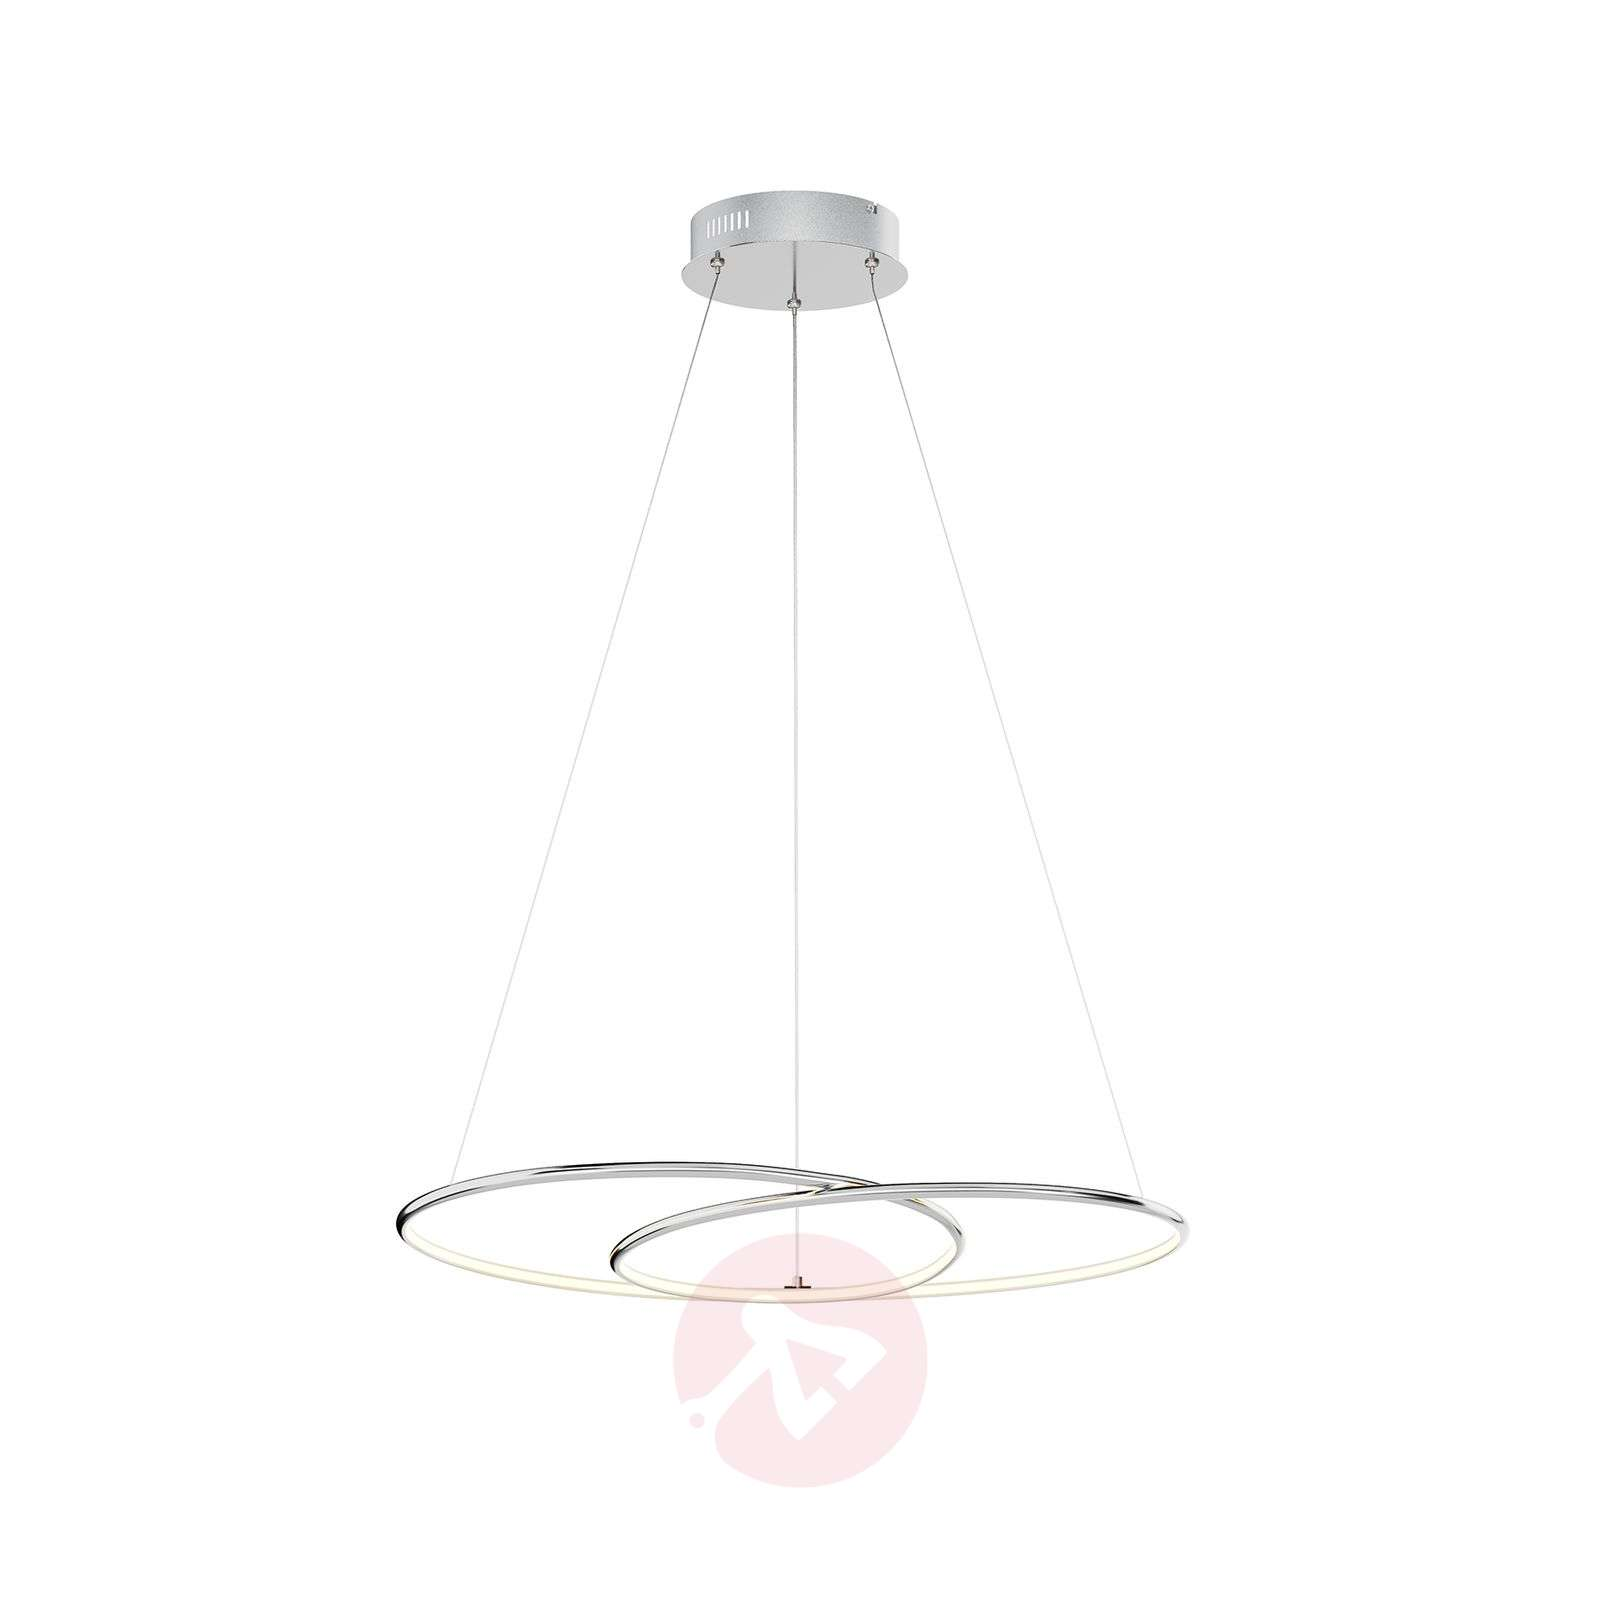 Lindby Lucy LED-riippuvalaisin, 70 cm, kromi-9639142-02